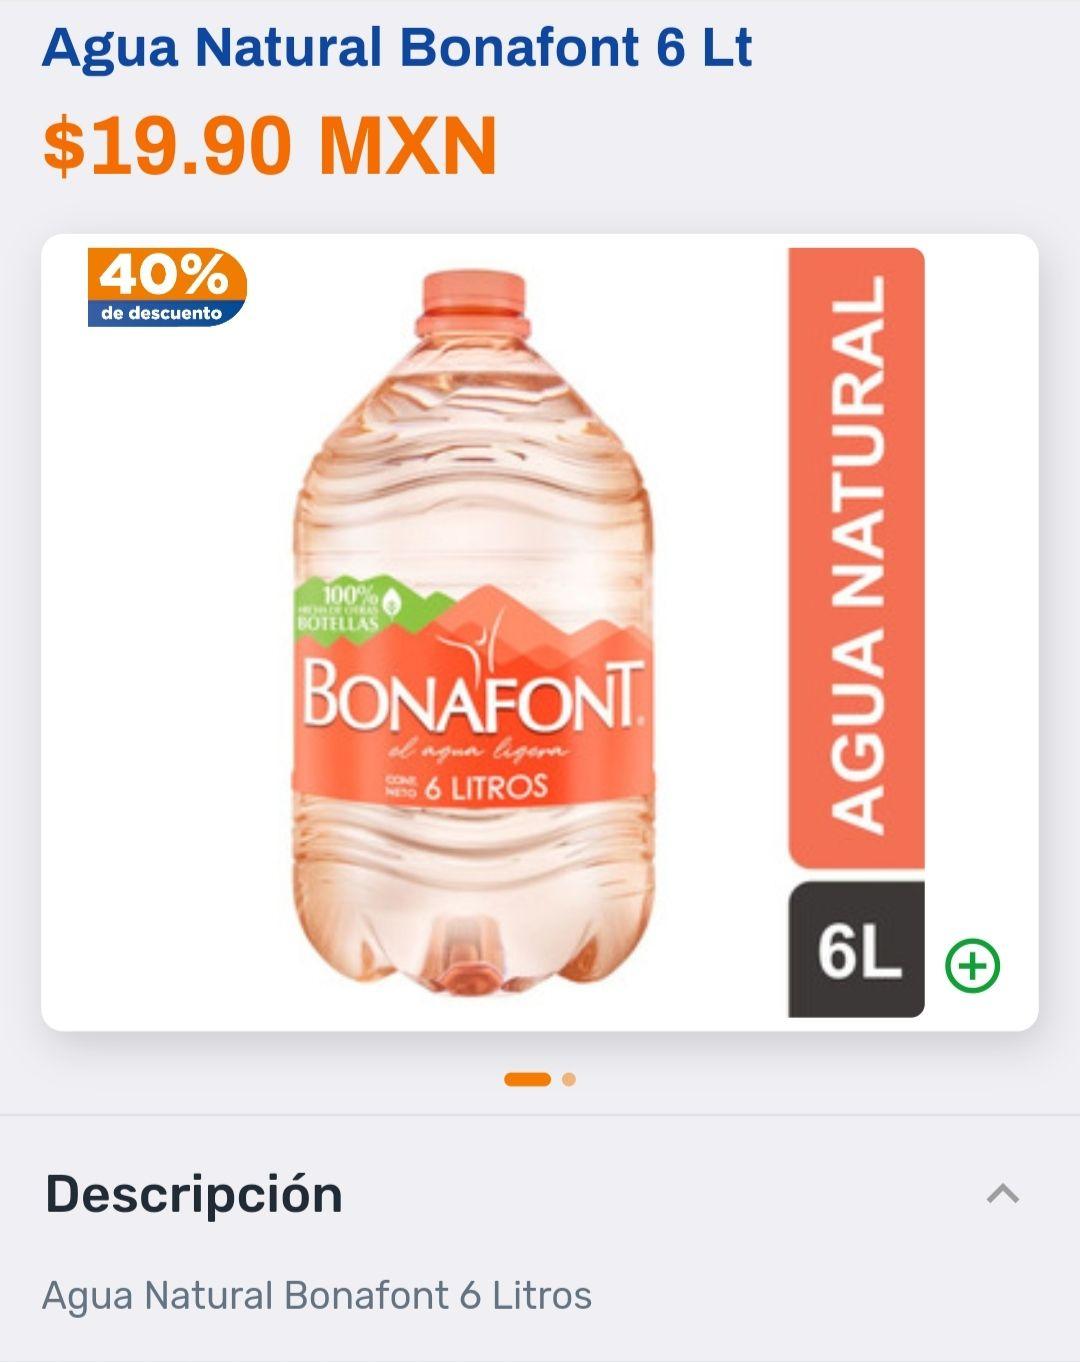 Chedraui: Agua bonafont (varios) 40% de descuento.